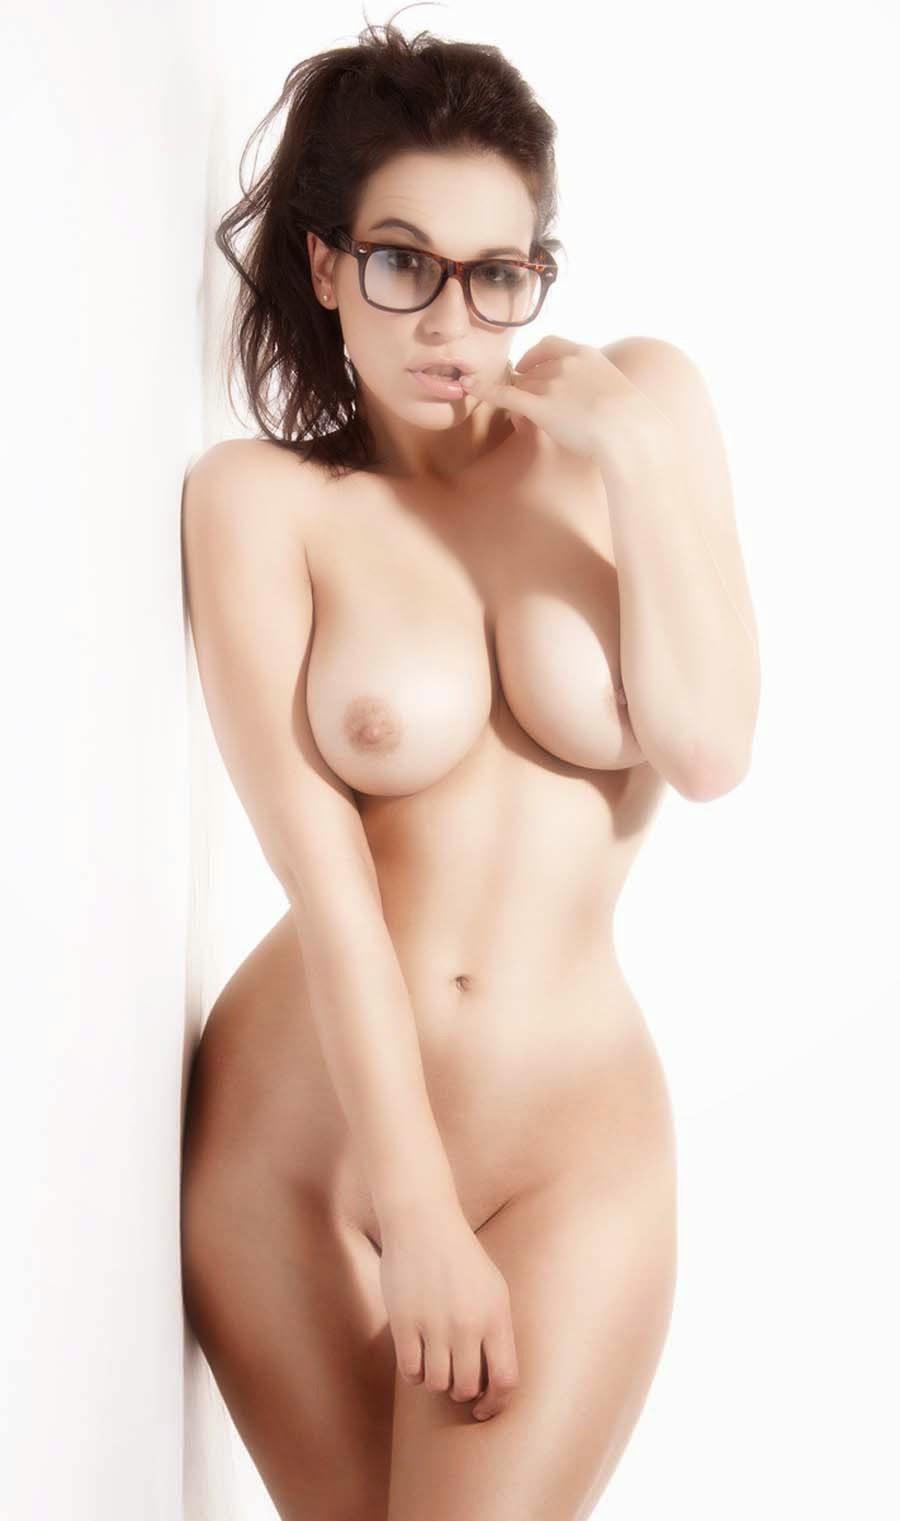 Voluptuous Curvy Nude Images 43